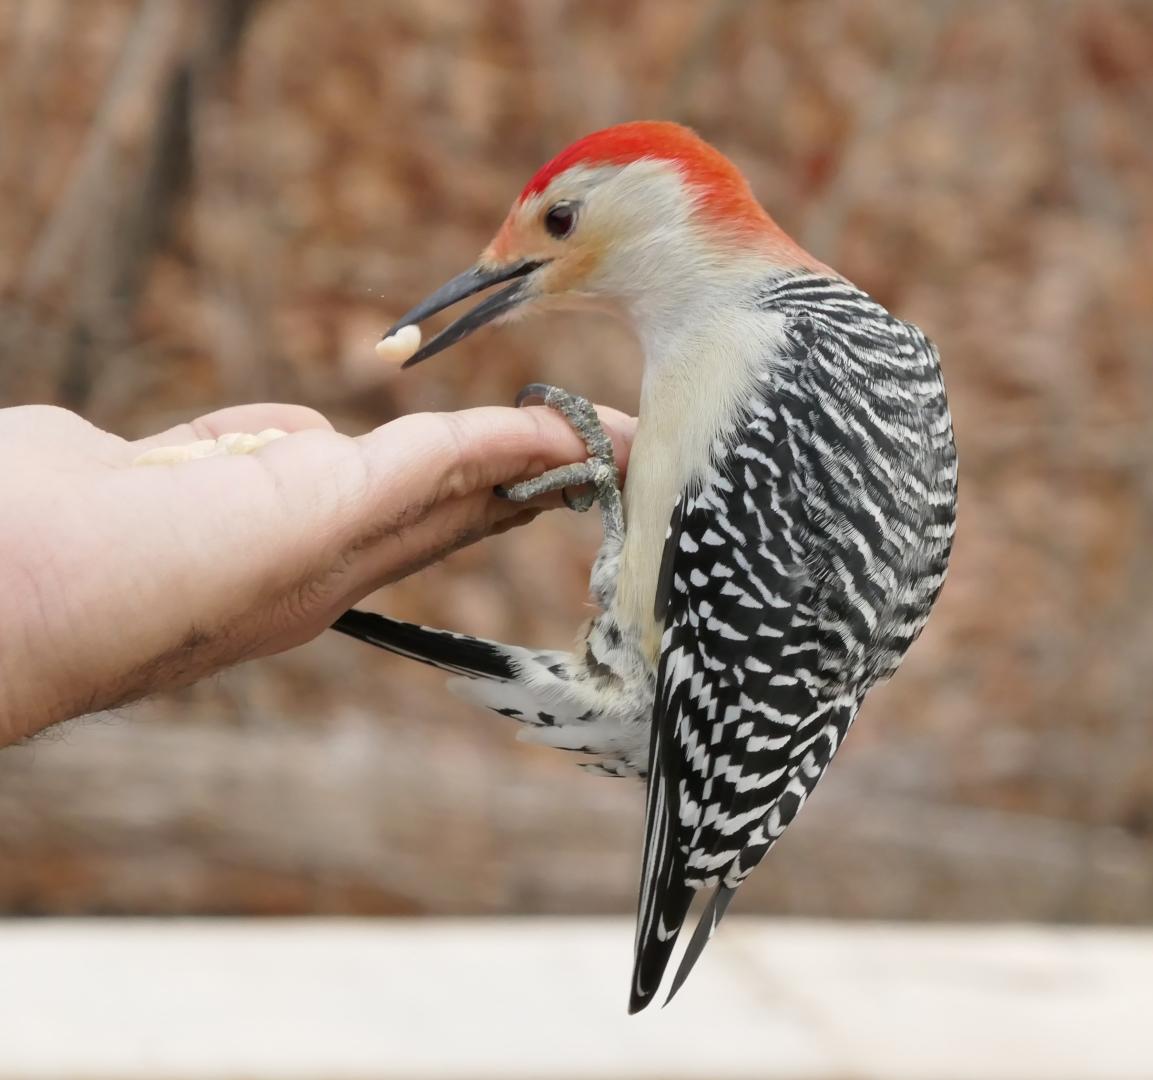 Diane Pezzini – Red Bellied Woodpecker – HM